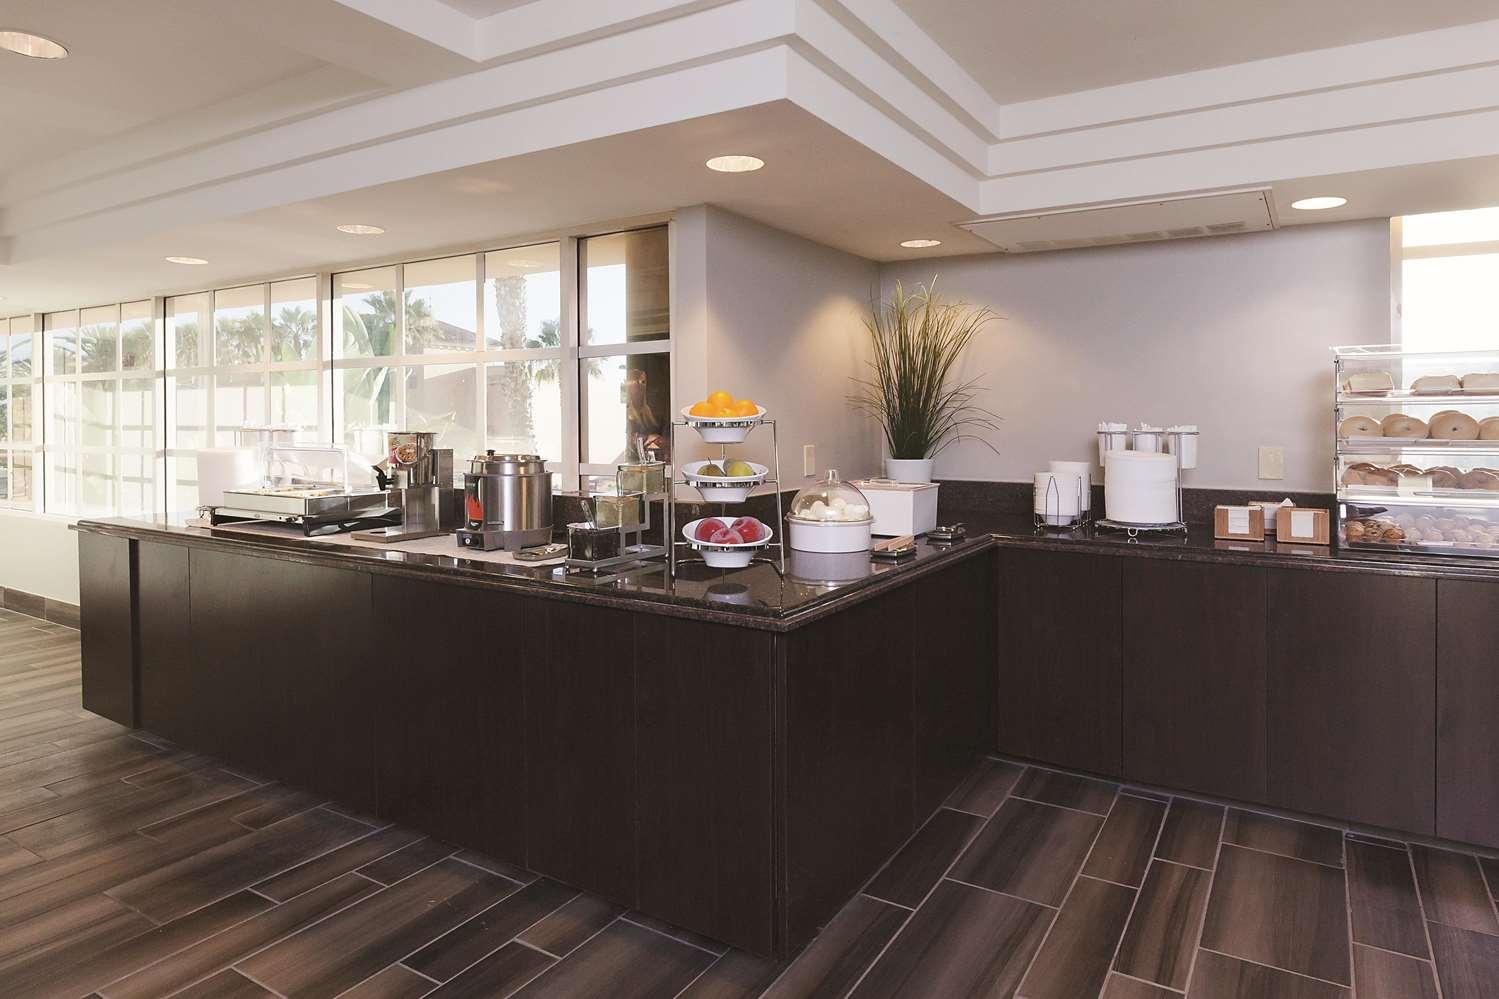 proam - La Quinta Inn & Suites Disneyland Anaheim